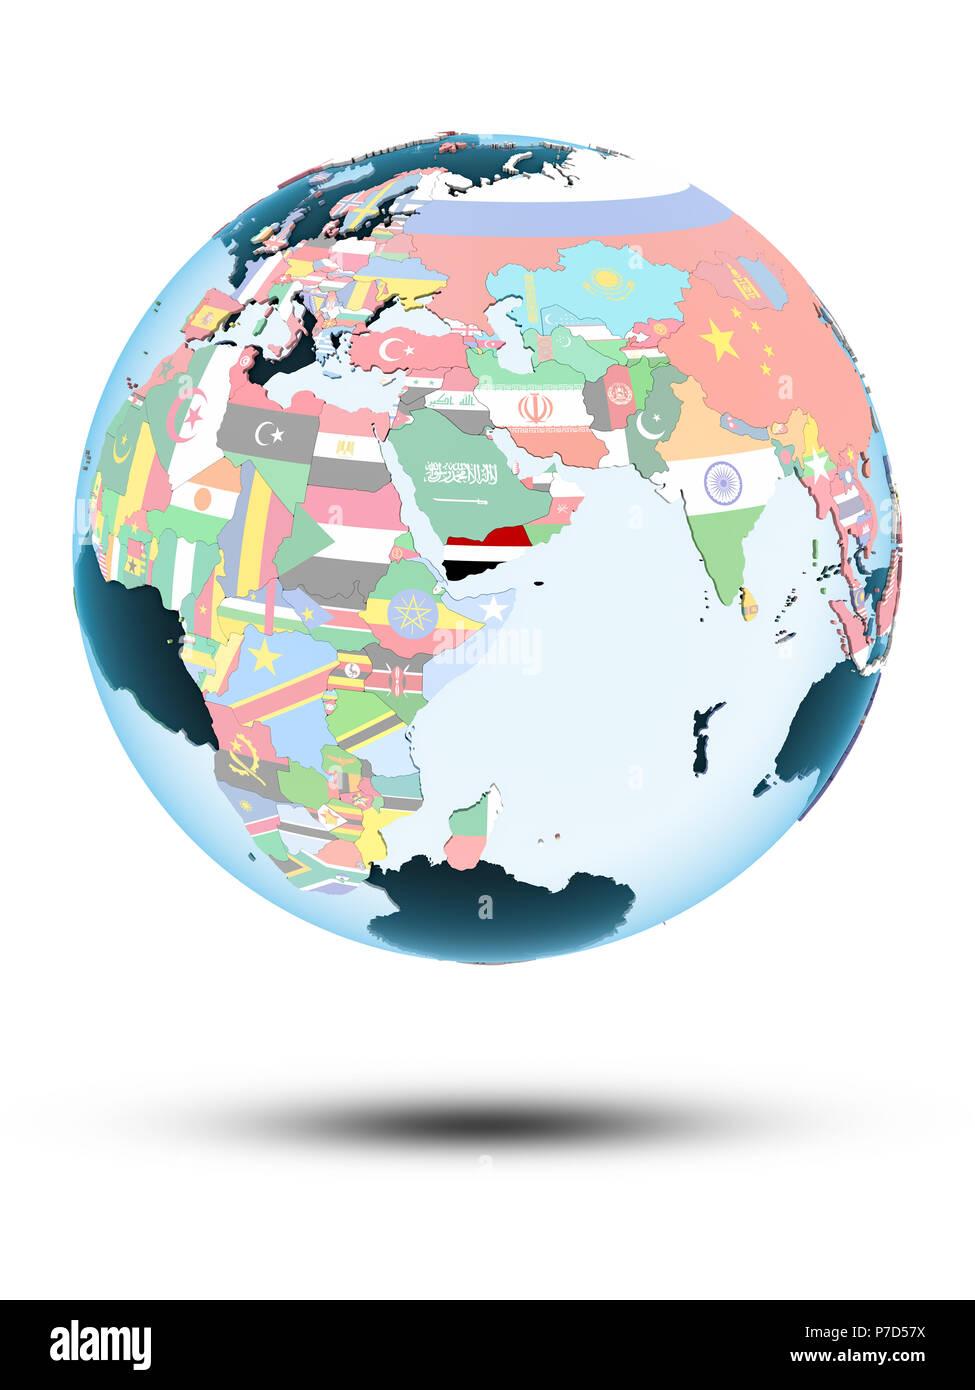 Yemen on political globe with shadow isolated on white background. 3D illustration. Stock Photo